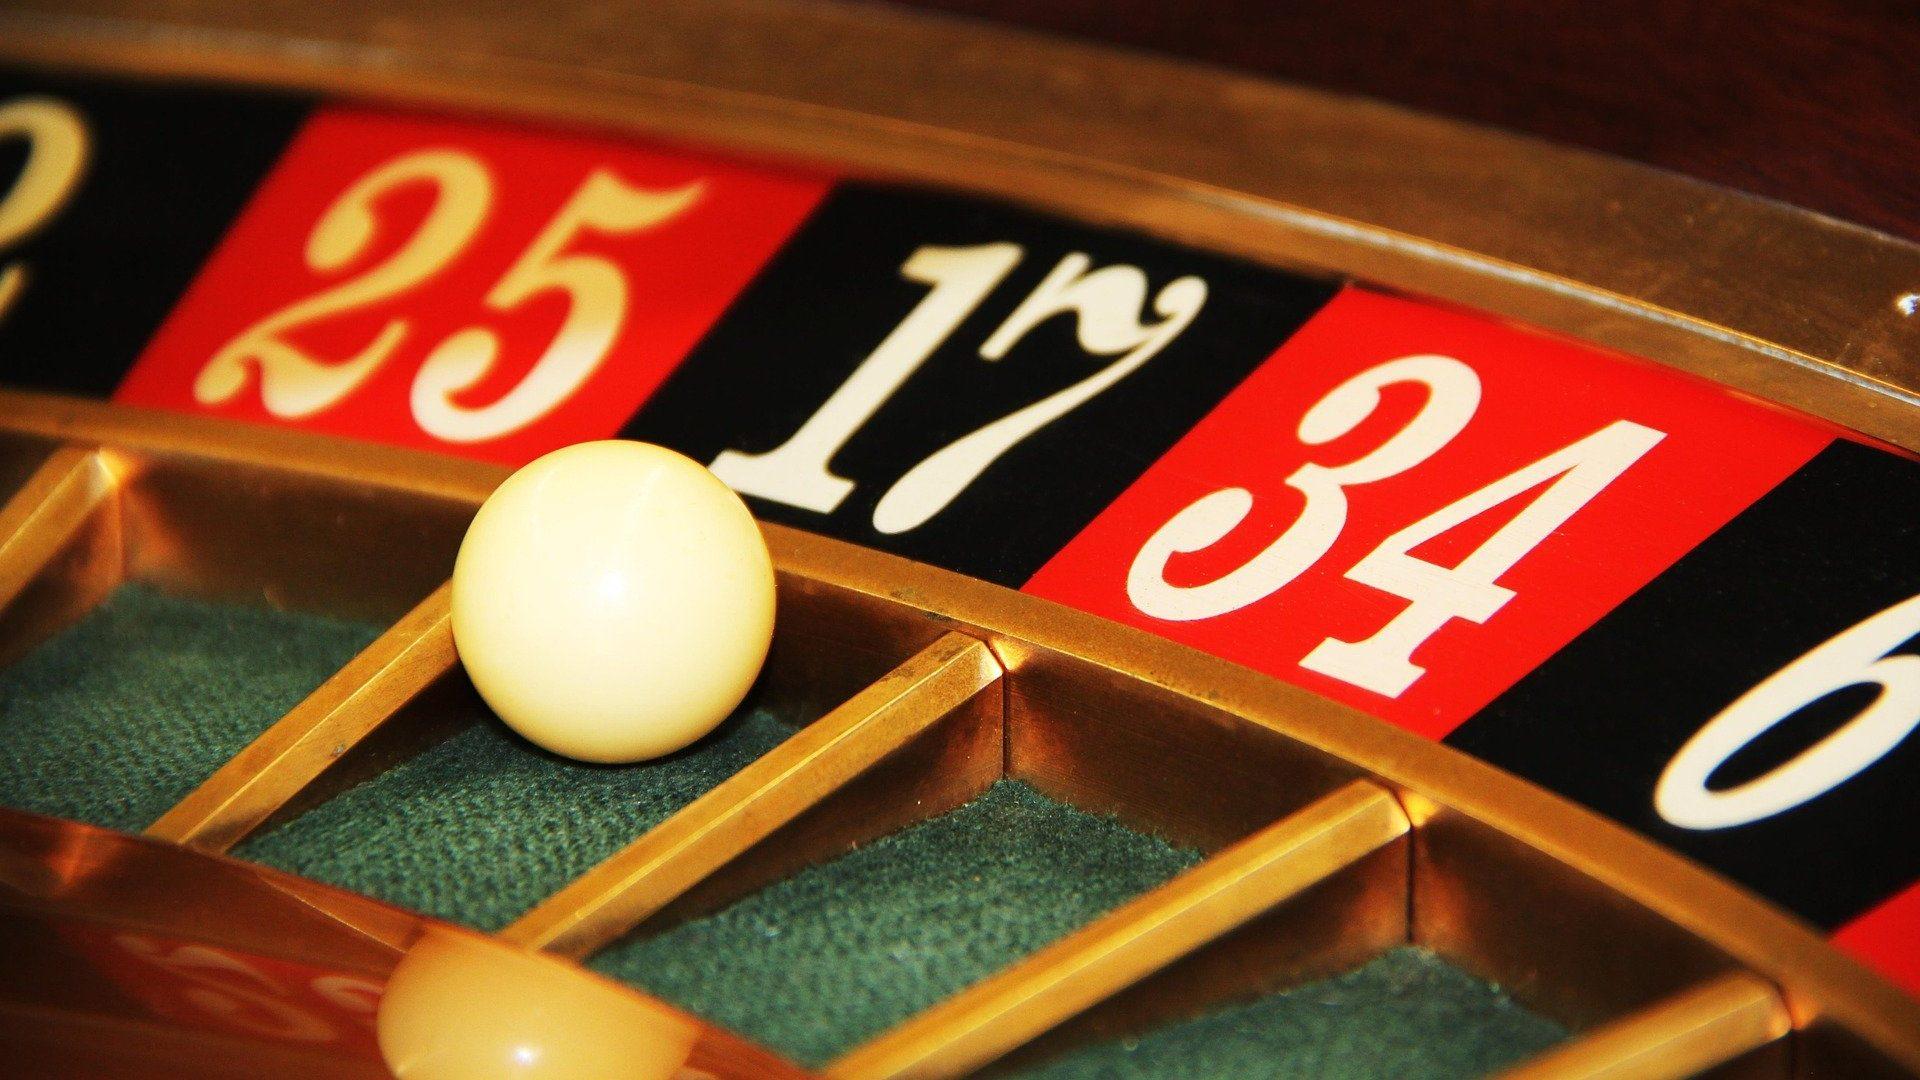 Ruby 888 casino